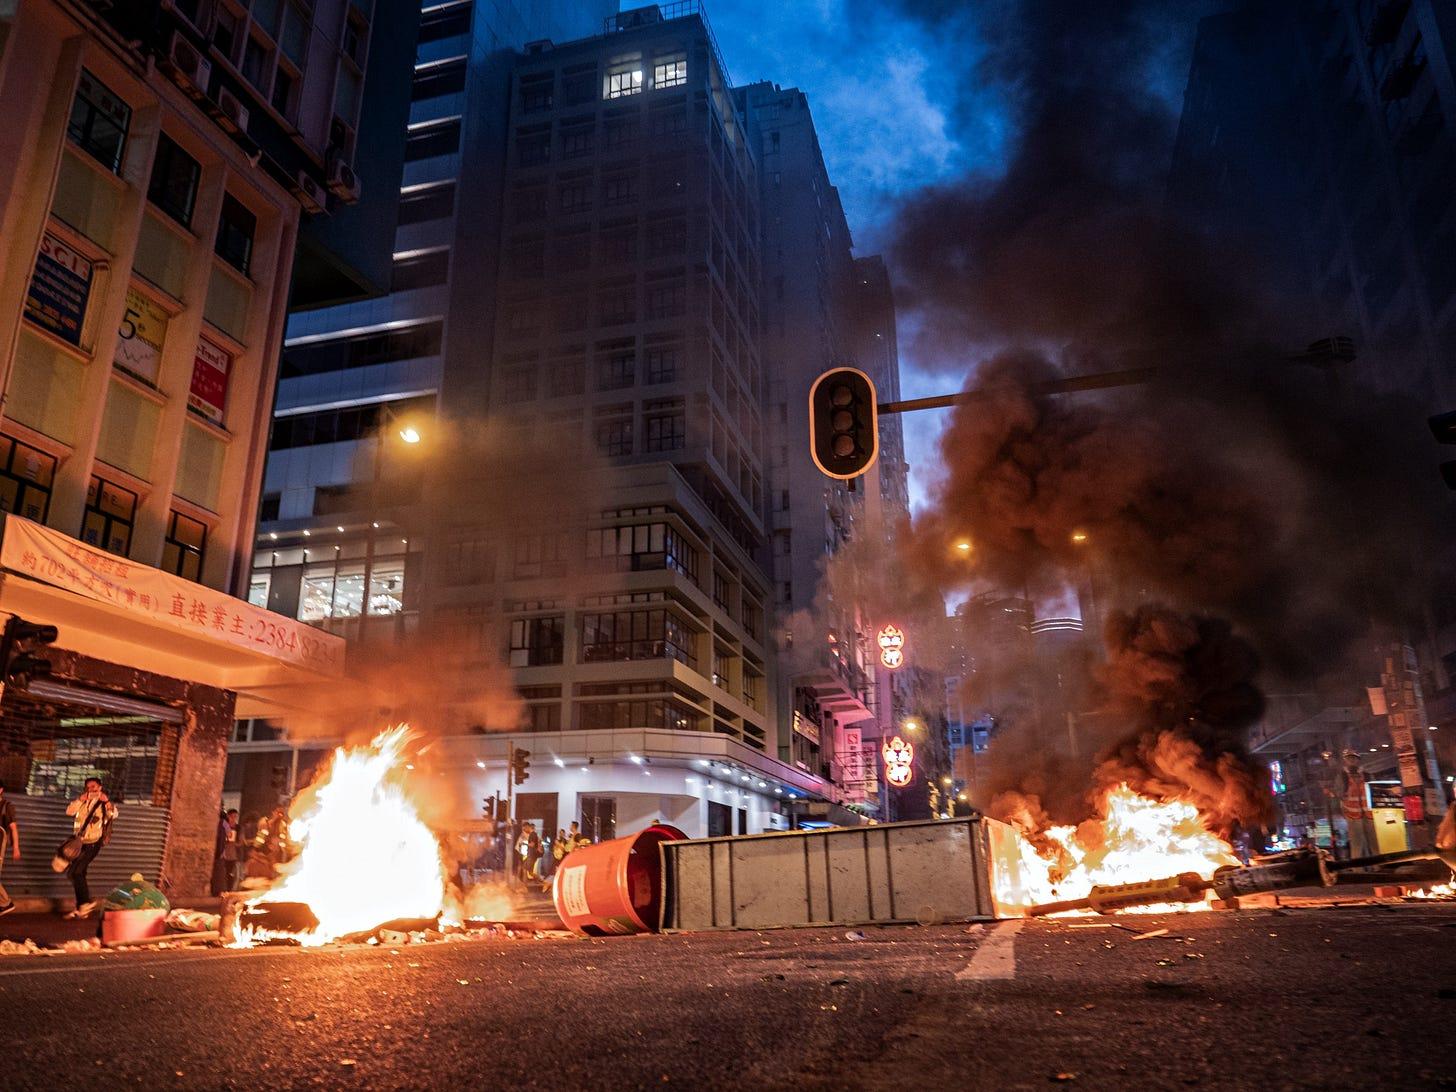 Hong Kong Anti-extradition Bill Protest, September 15th